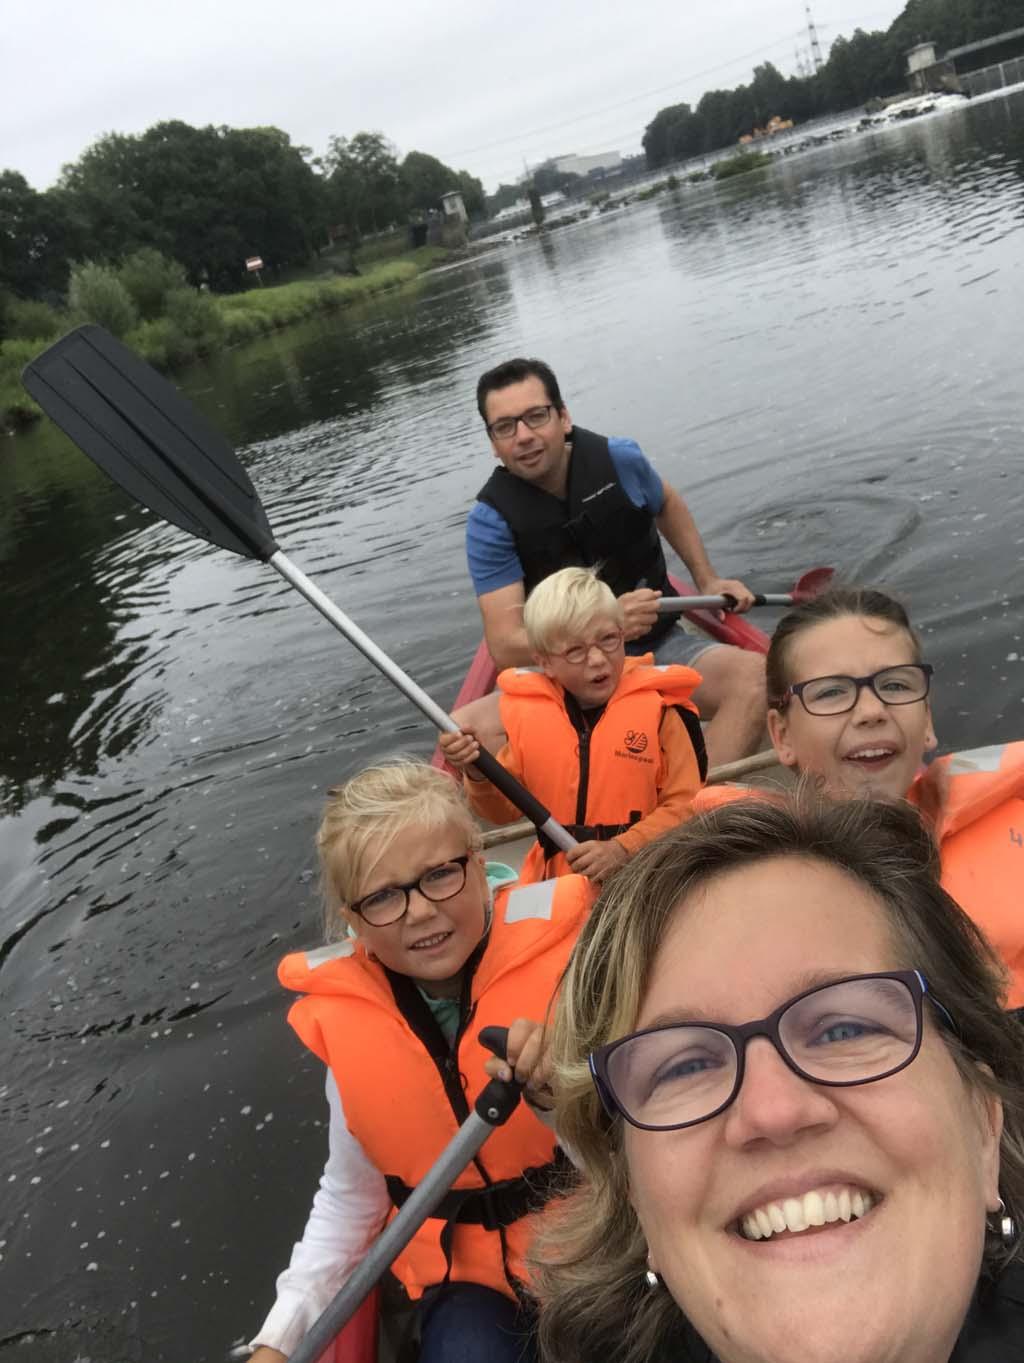 Familie selfie in de kano.